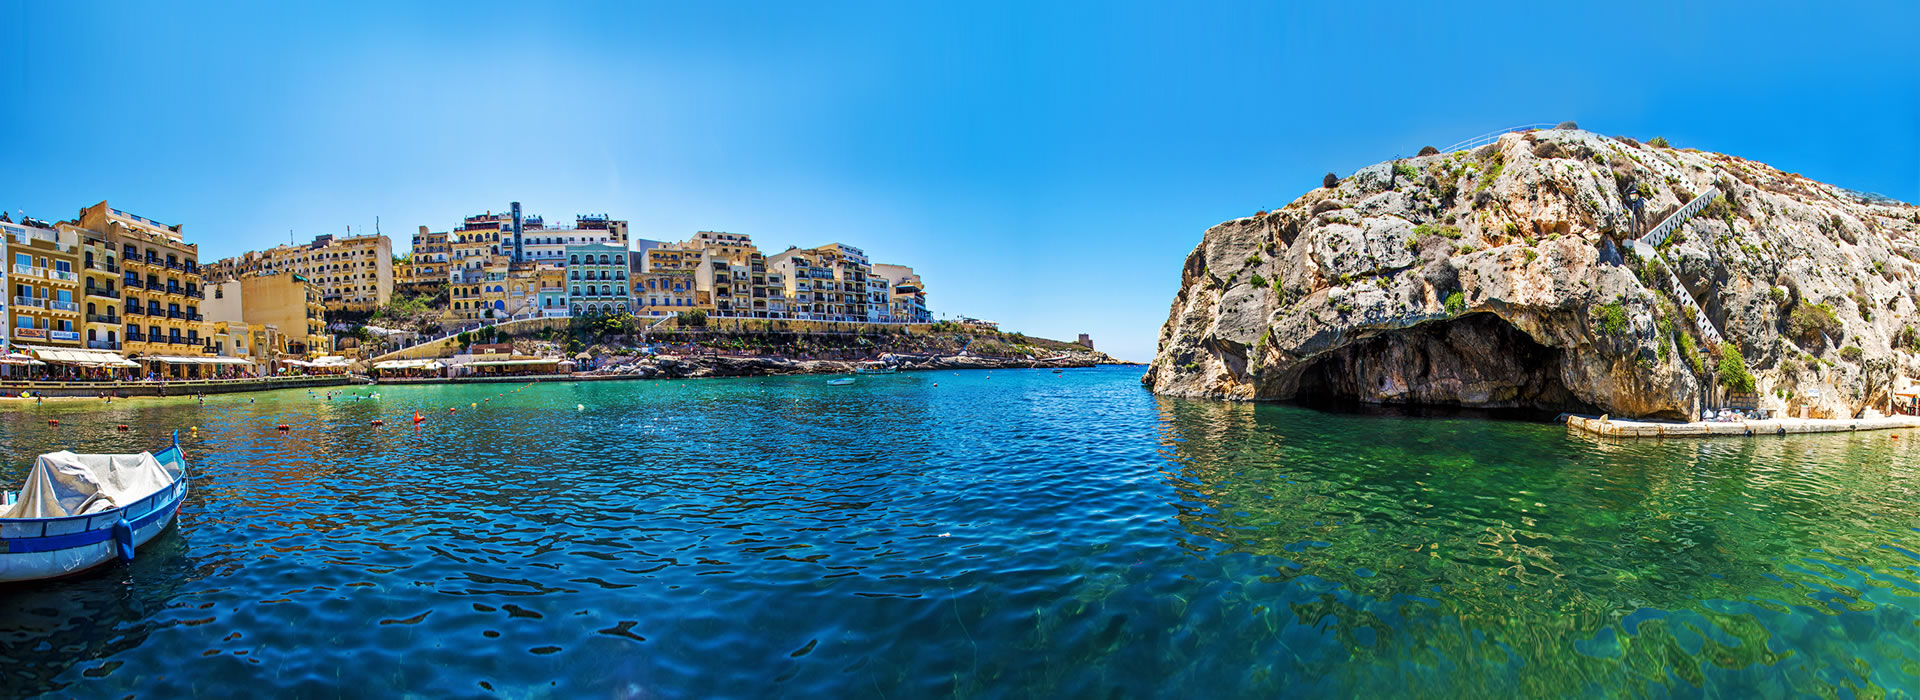 Videos de malta nautalia viajes - Apartamentos baratos en malta ...